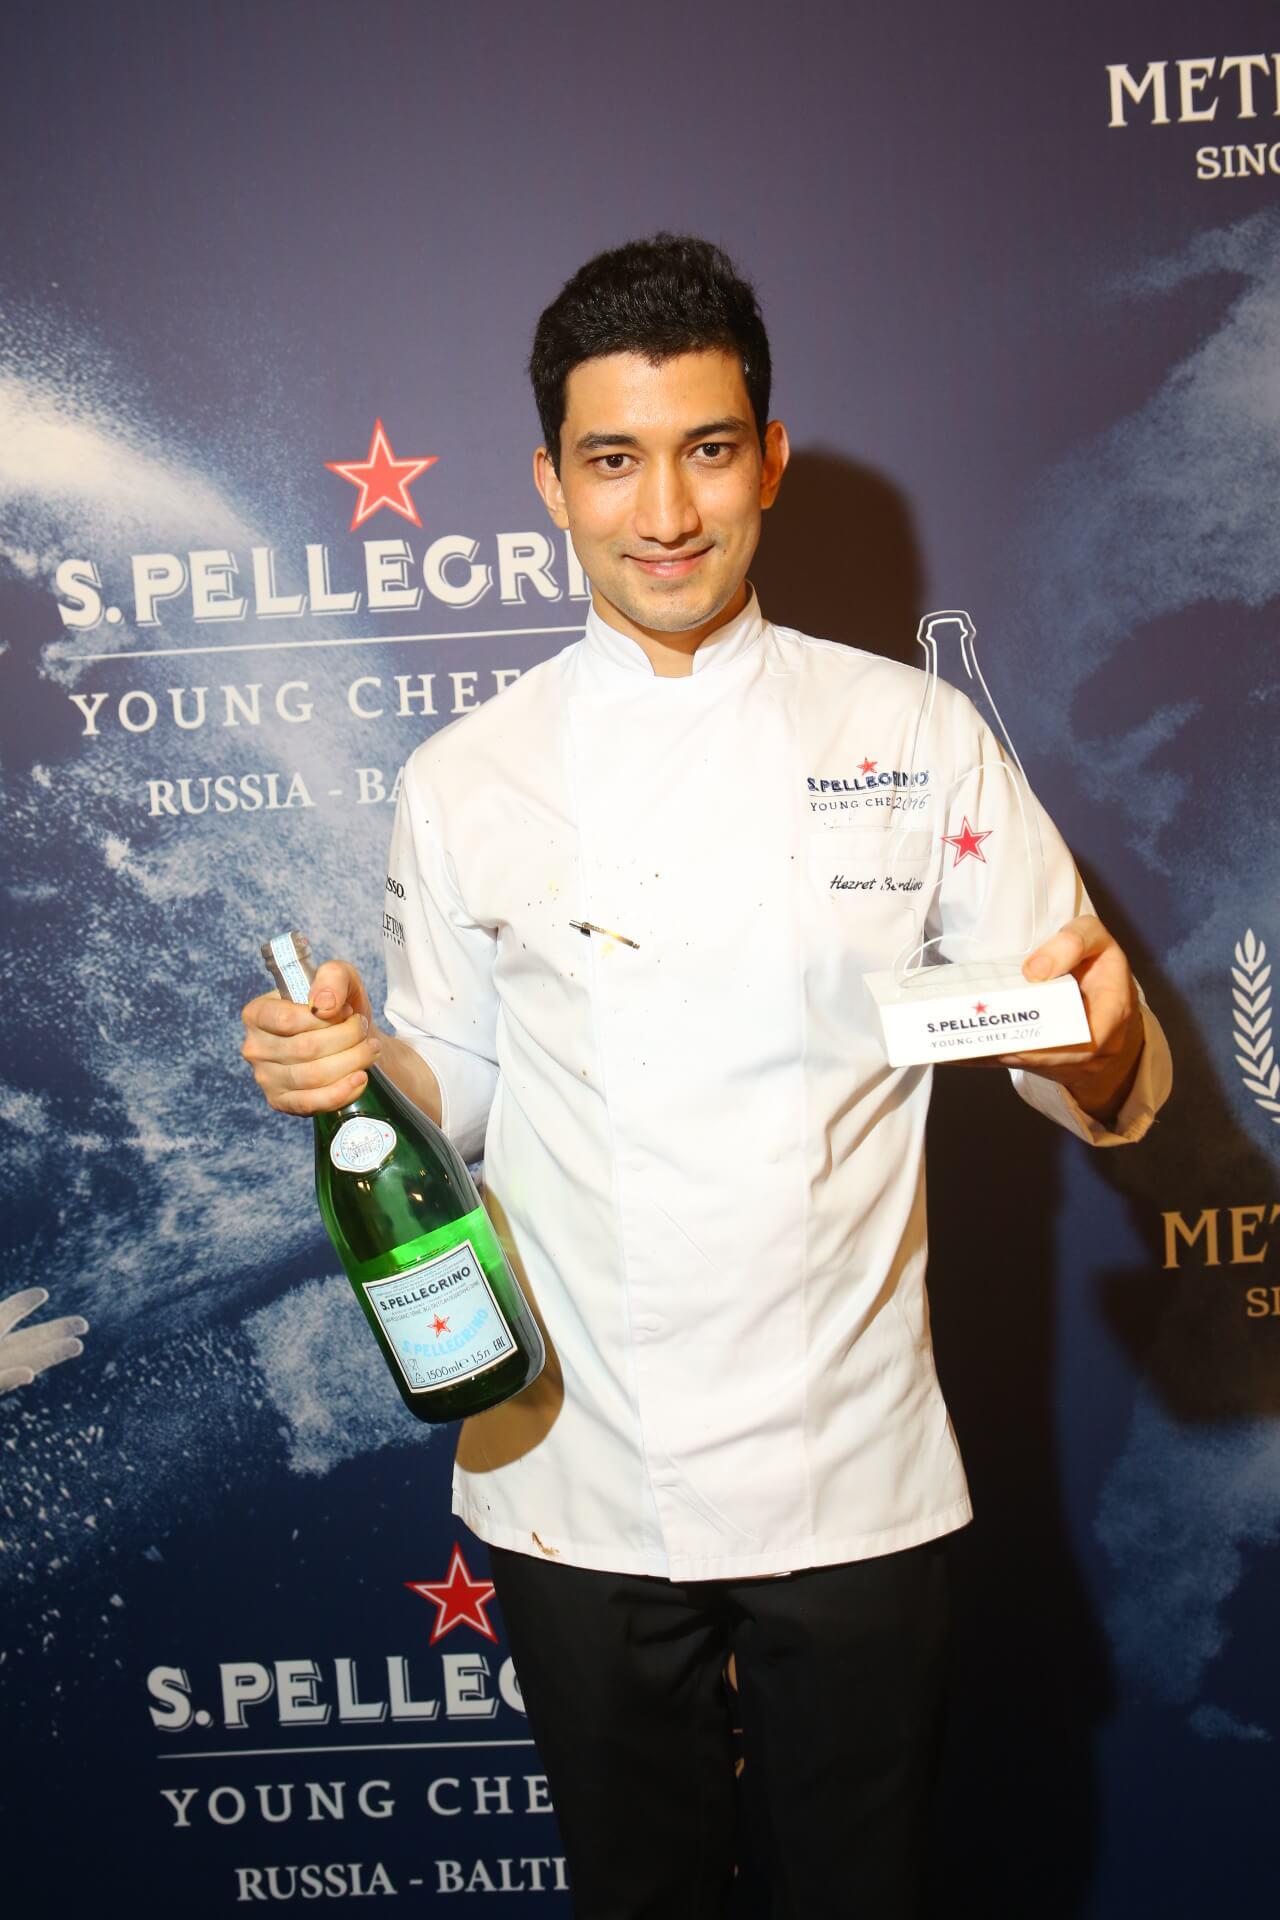 Победителем регионального этапа S.Pellegrino Young Chef 2016 стал Хезрет Бердиев